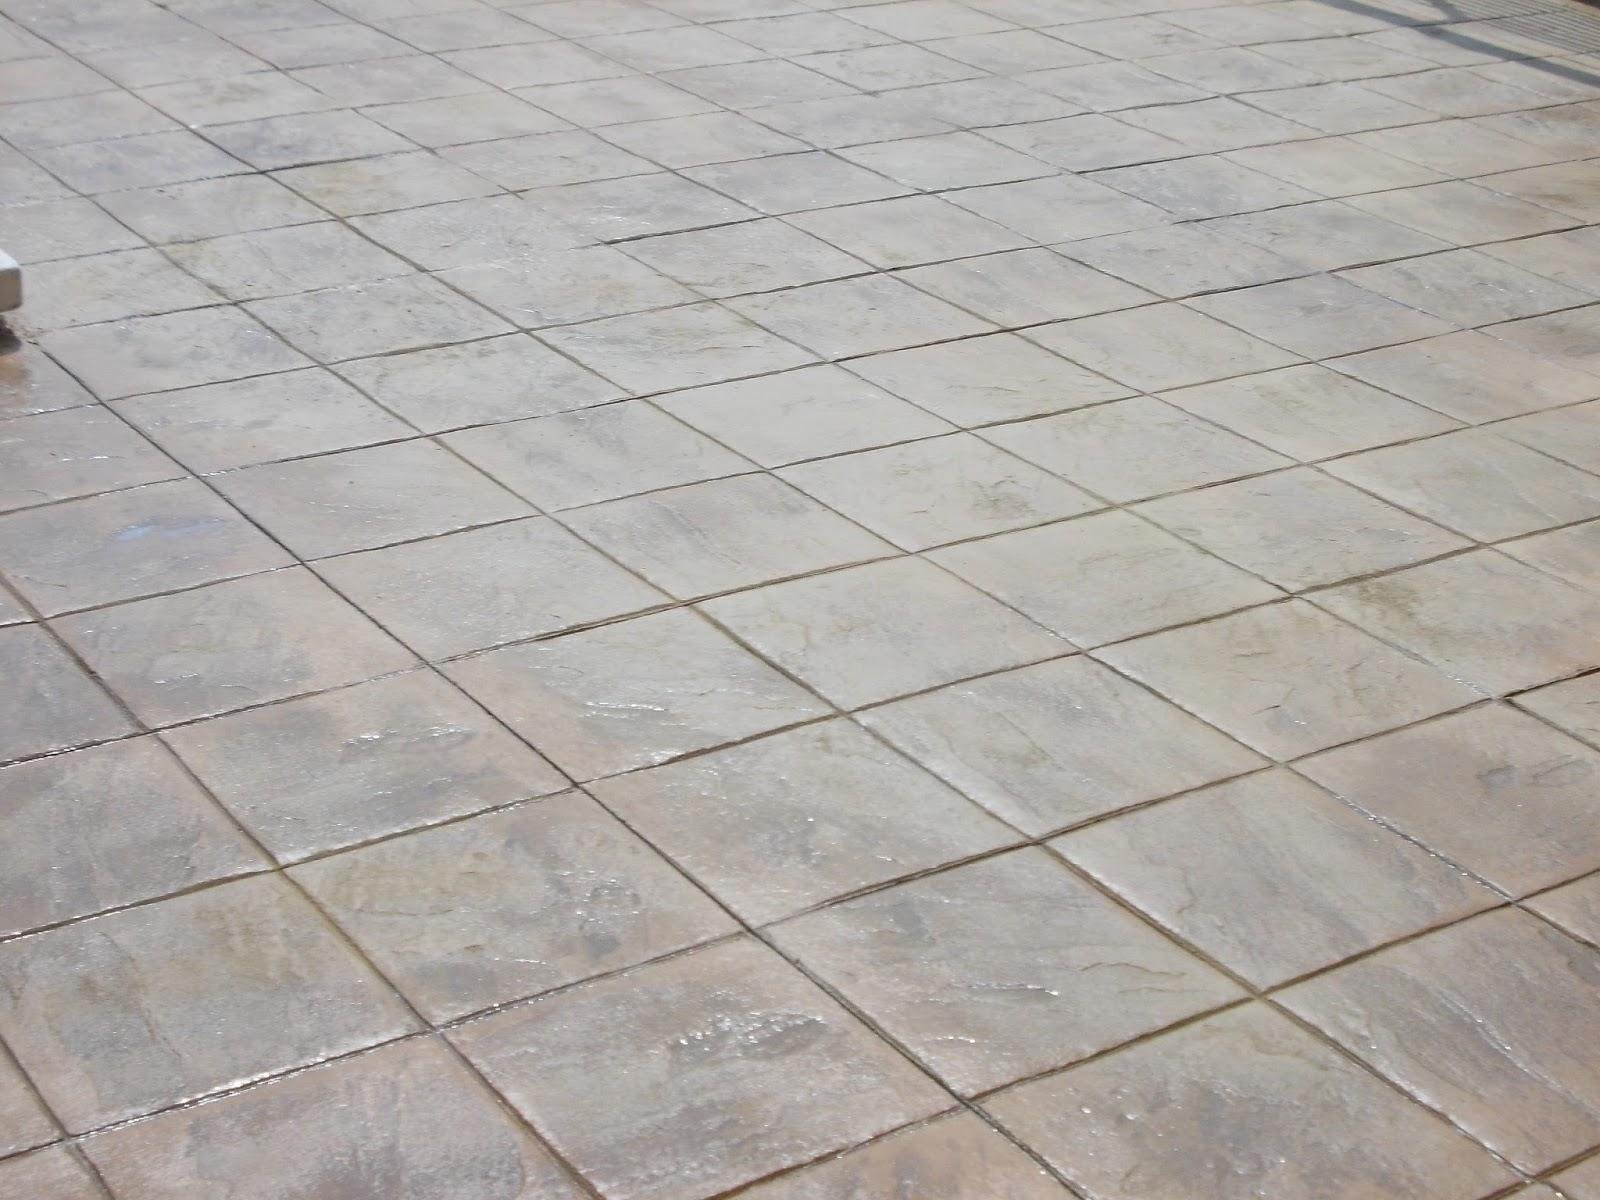 Pavimento continuo de hormig n impreso en piscina for Hormigon para pavimentos